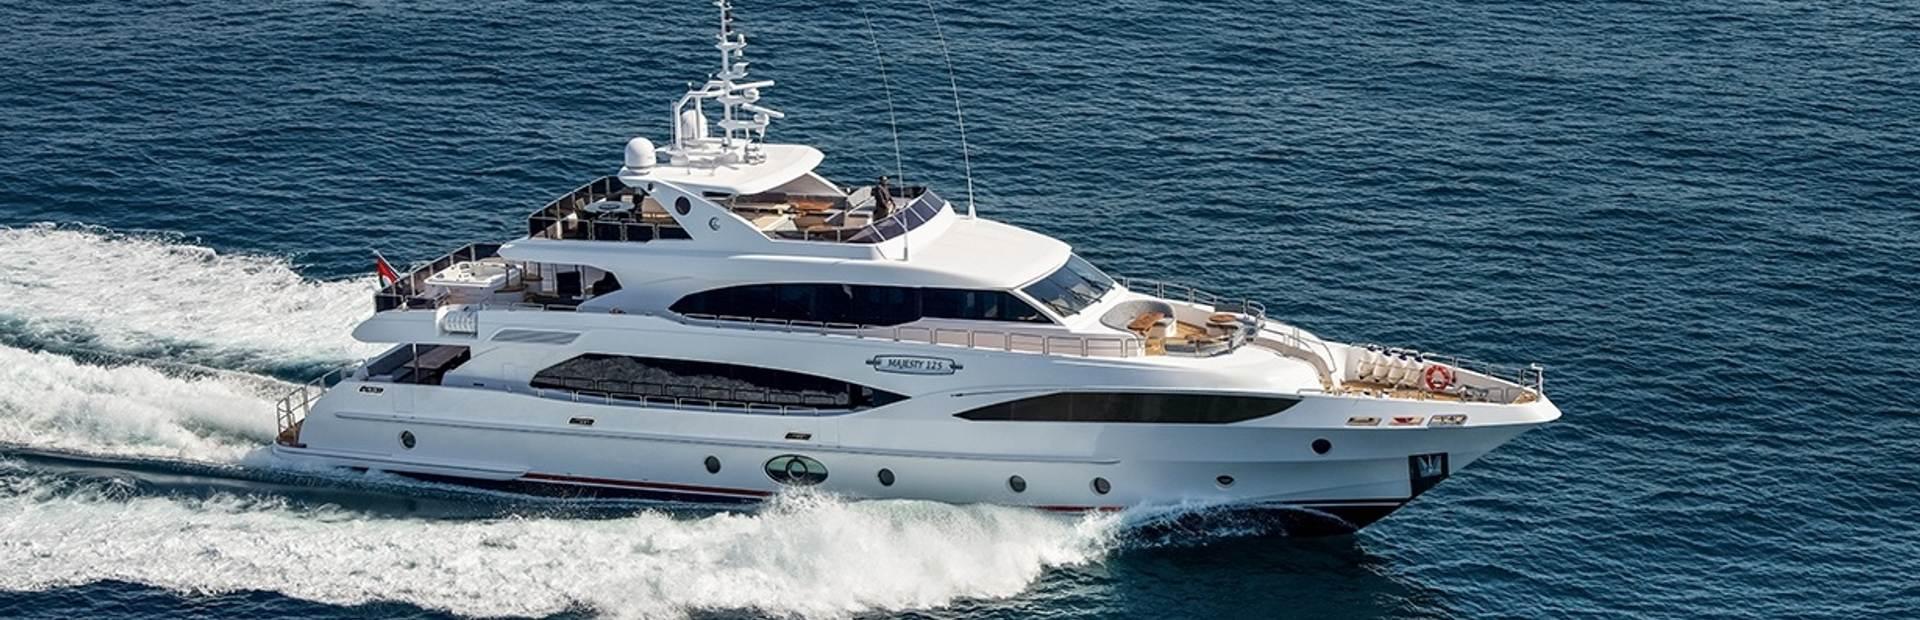 Majesty 125 Yacht Charter